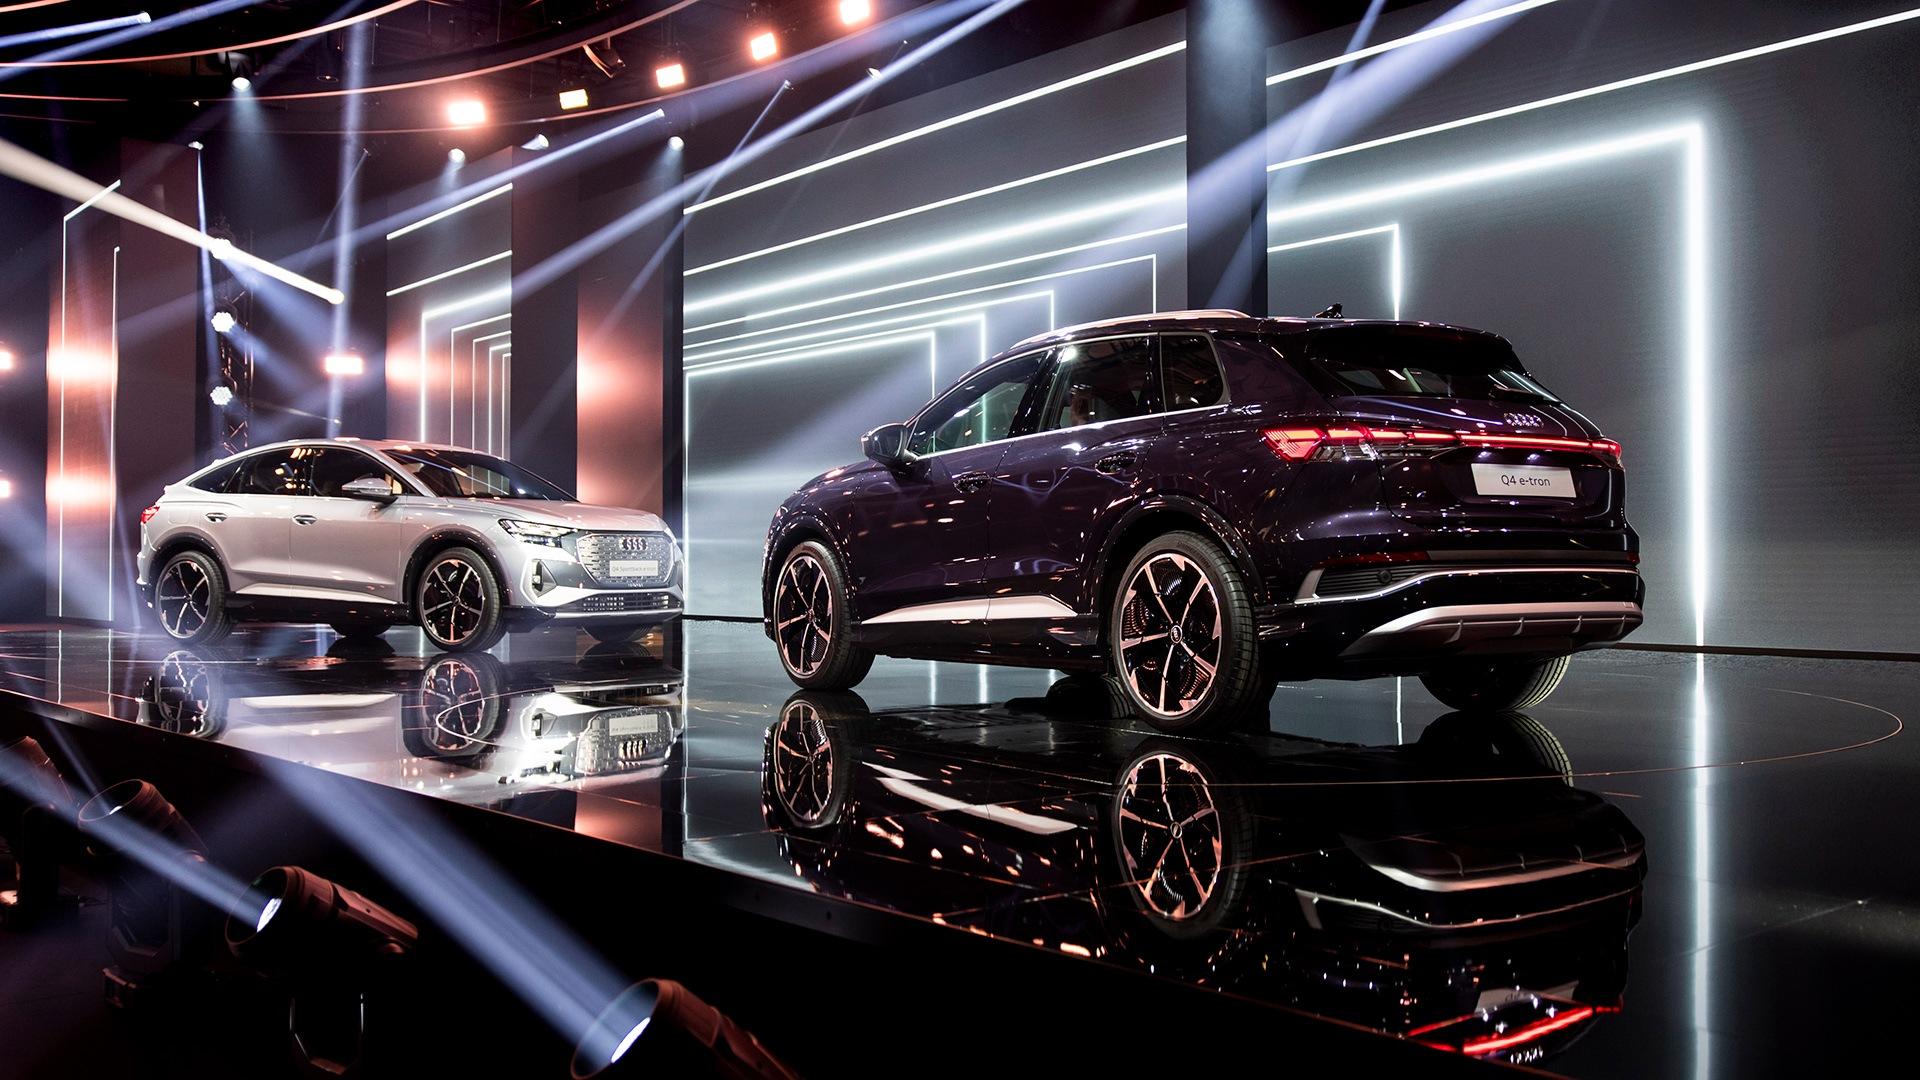 Nova modela Audi Q4 e-tron bosta na evropske trge prišla poleti 2021.